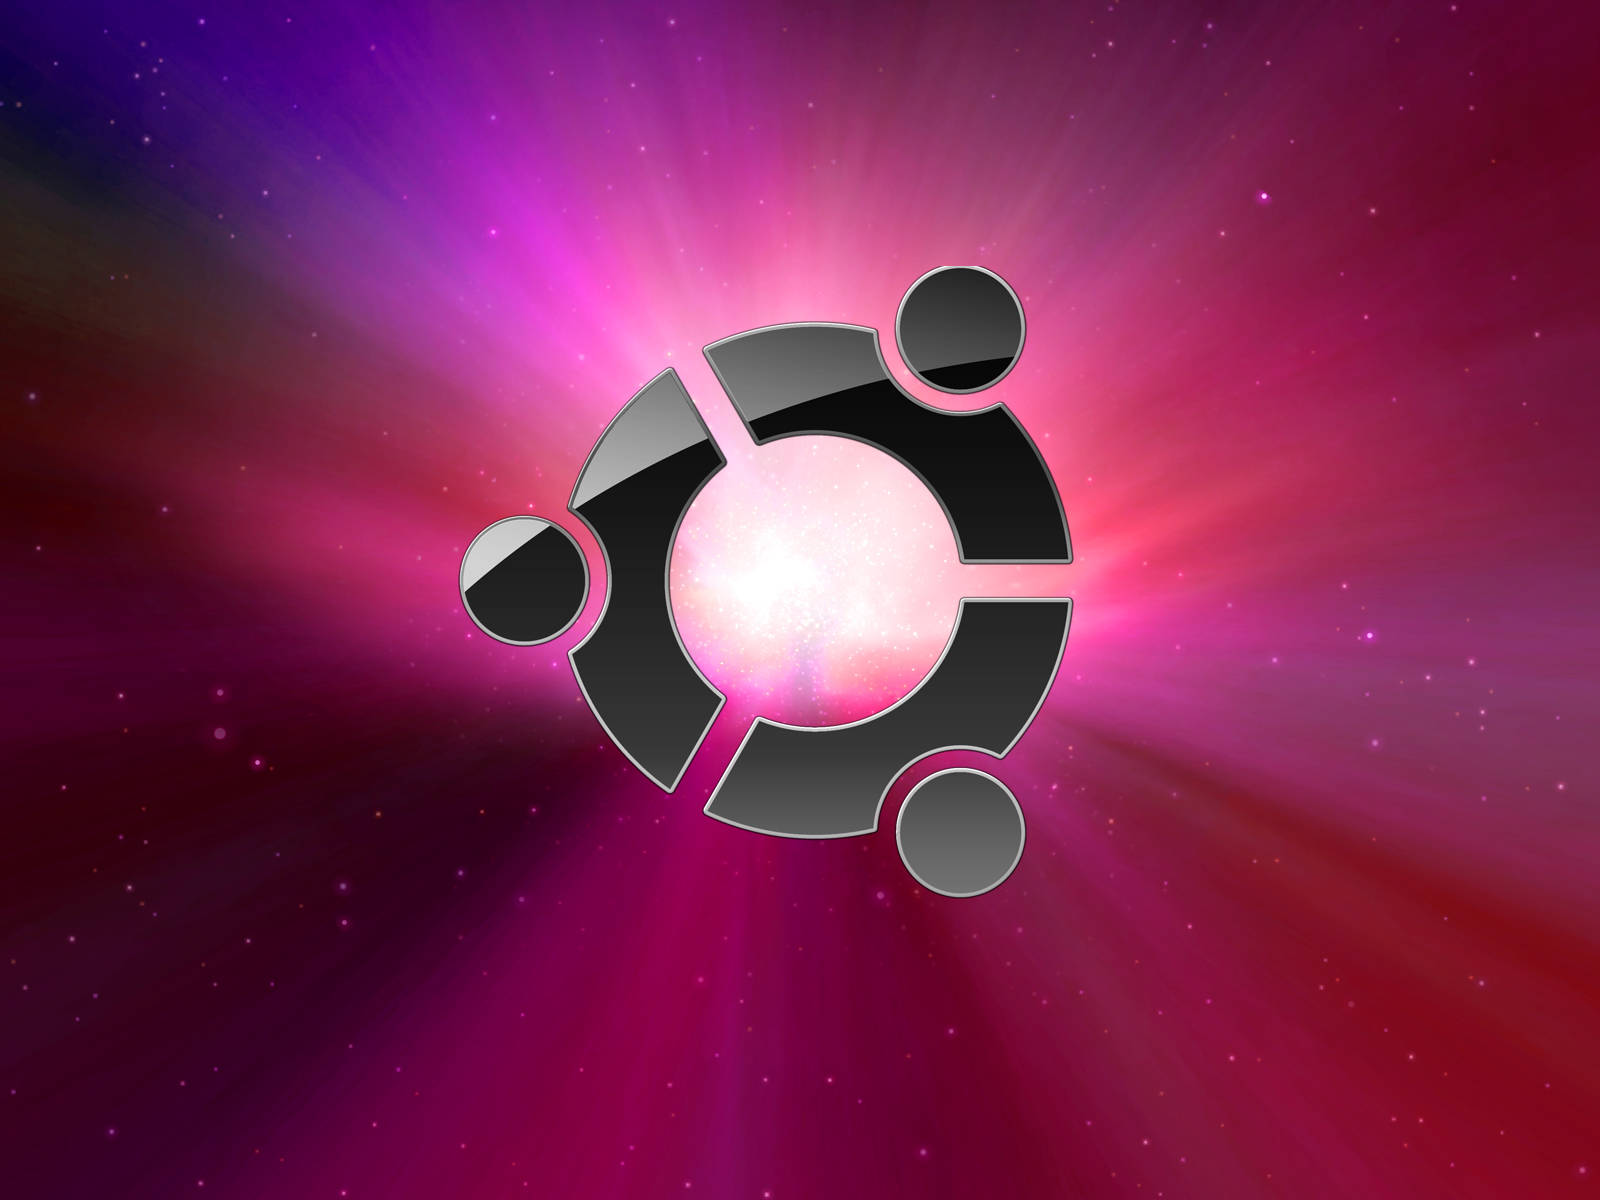 Linux Ubuntu 16001200 Wallpaper 615588 1600x1200